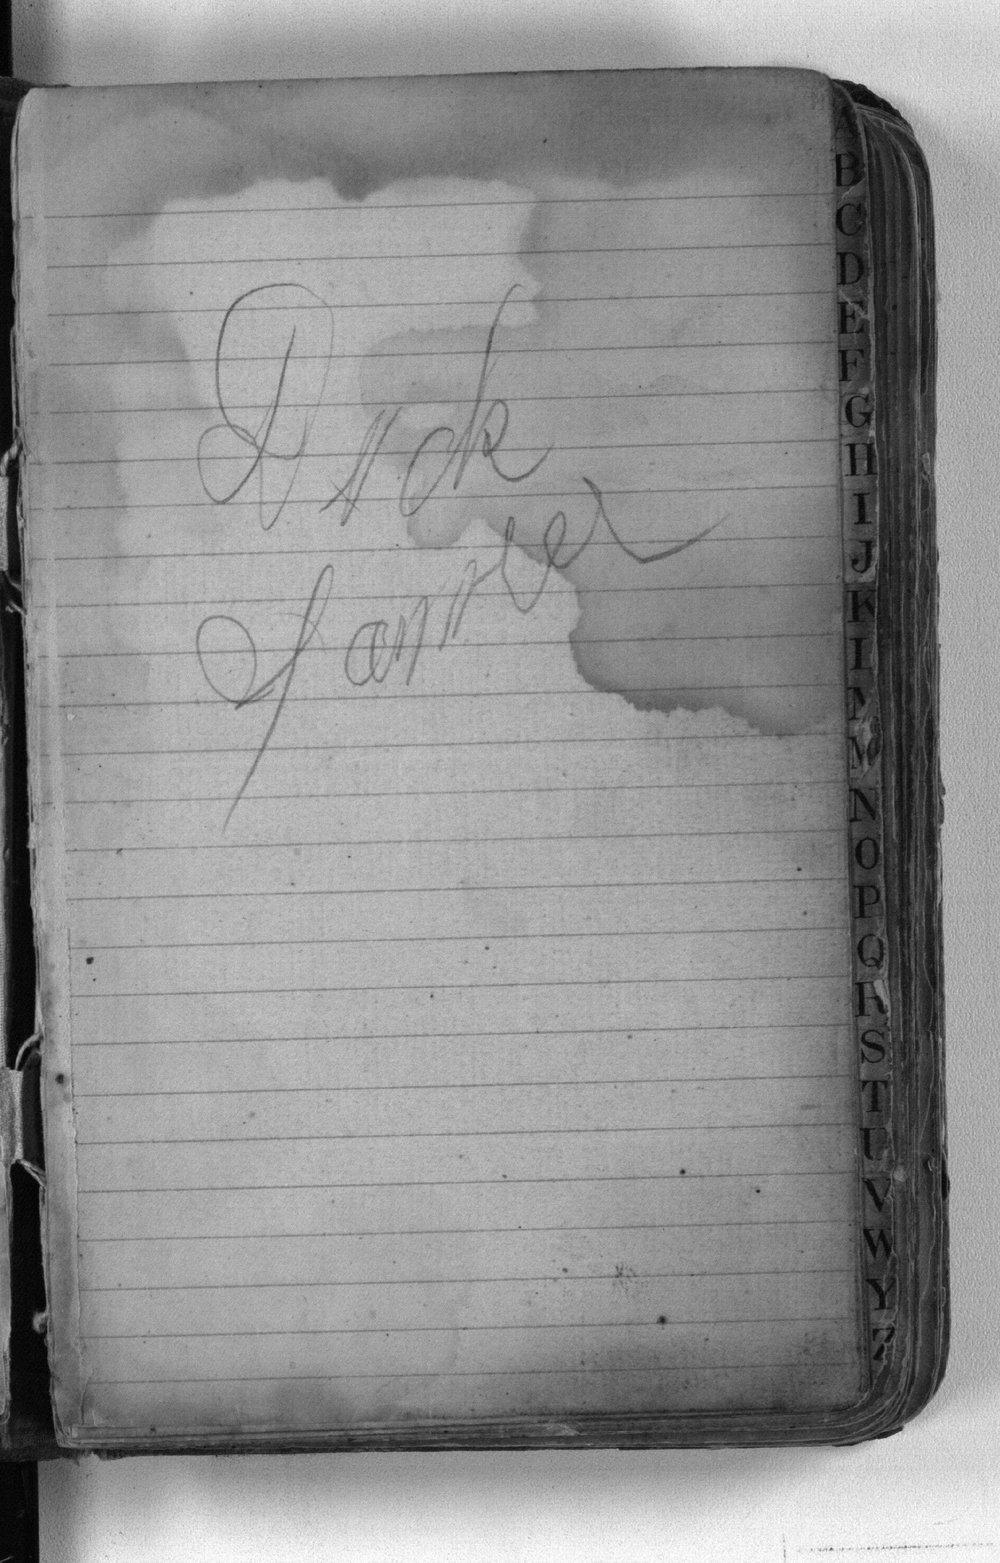 F. W. Yanner cookbook - signature